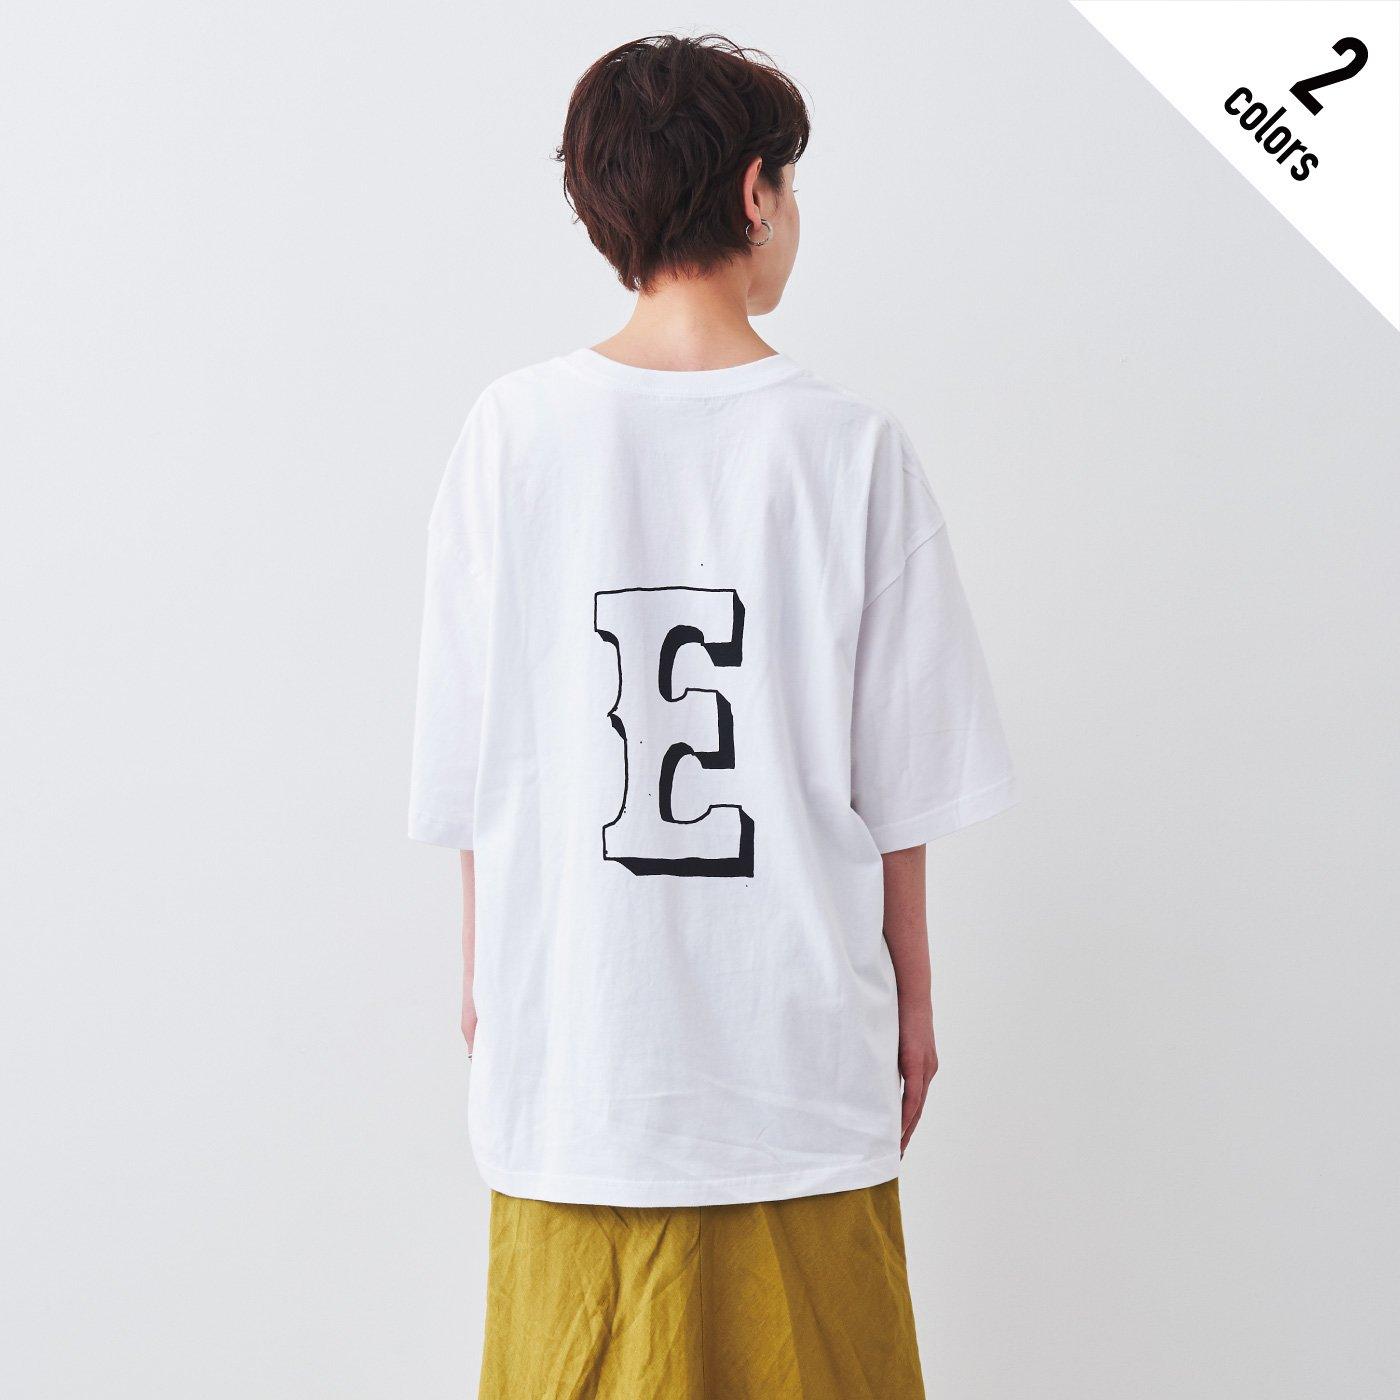 MEDE19F 〈SELECT〉 EDWIN アーティストコラボTシャツ no.2〈ニシクボサユリ:E〉